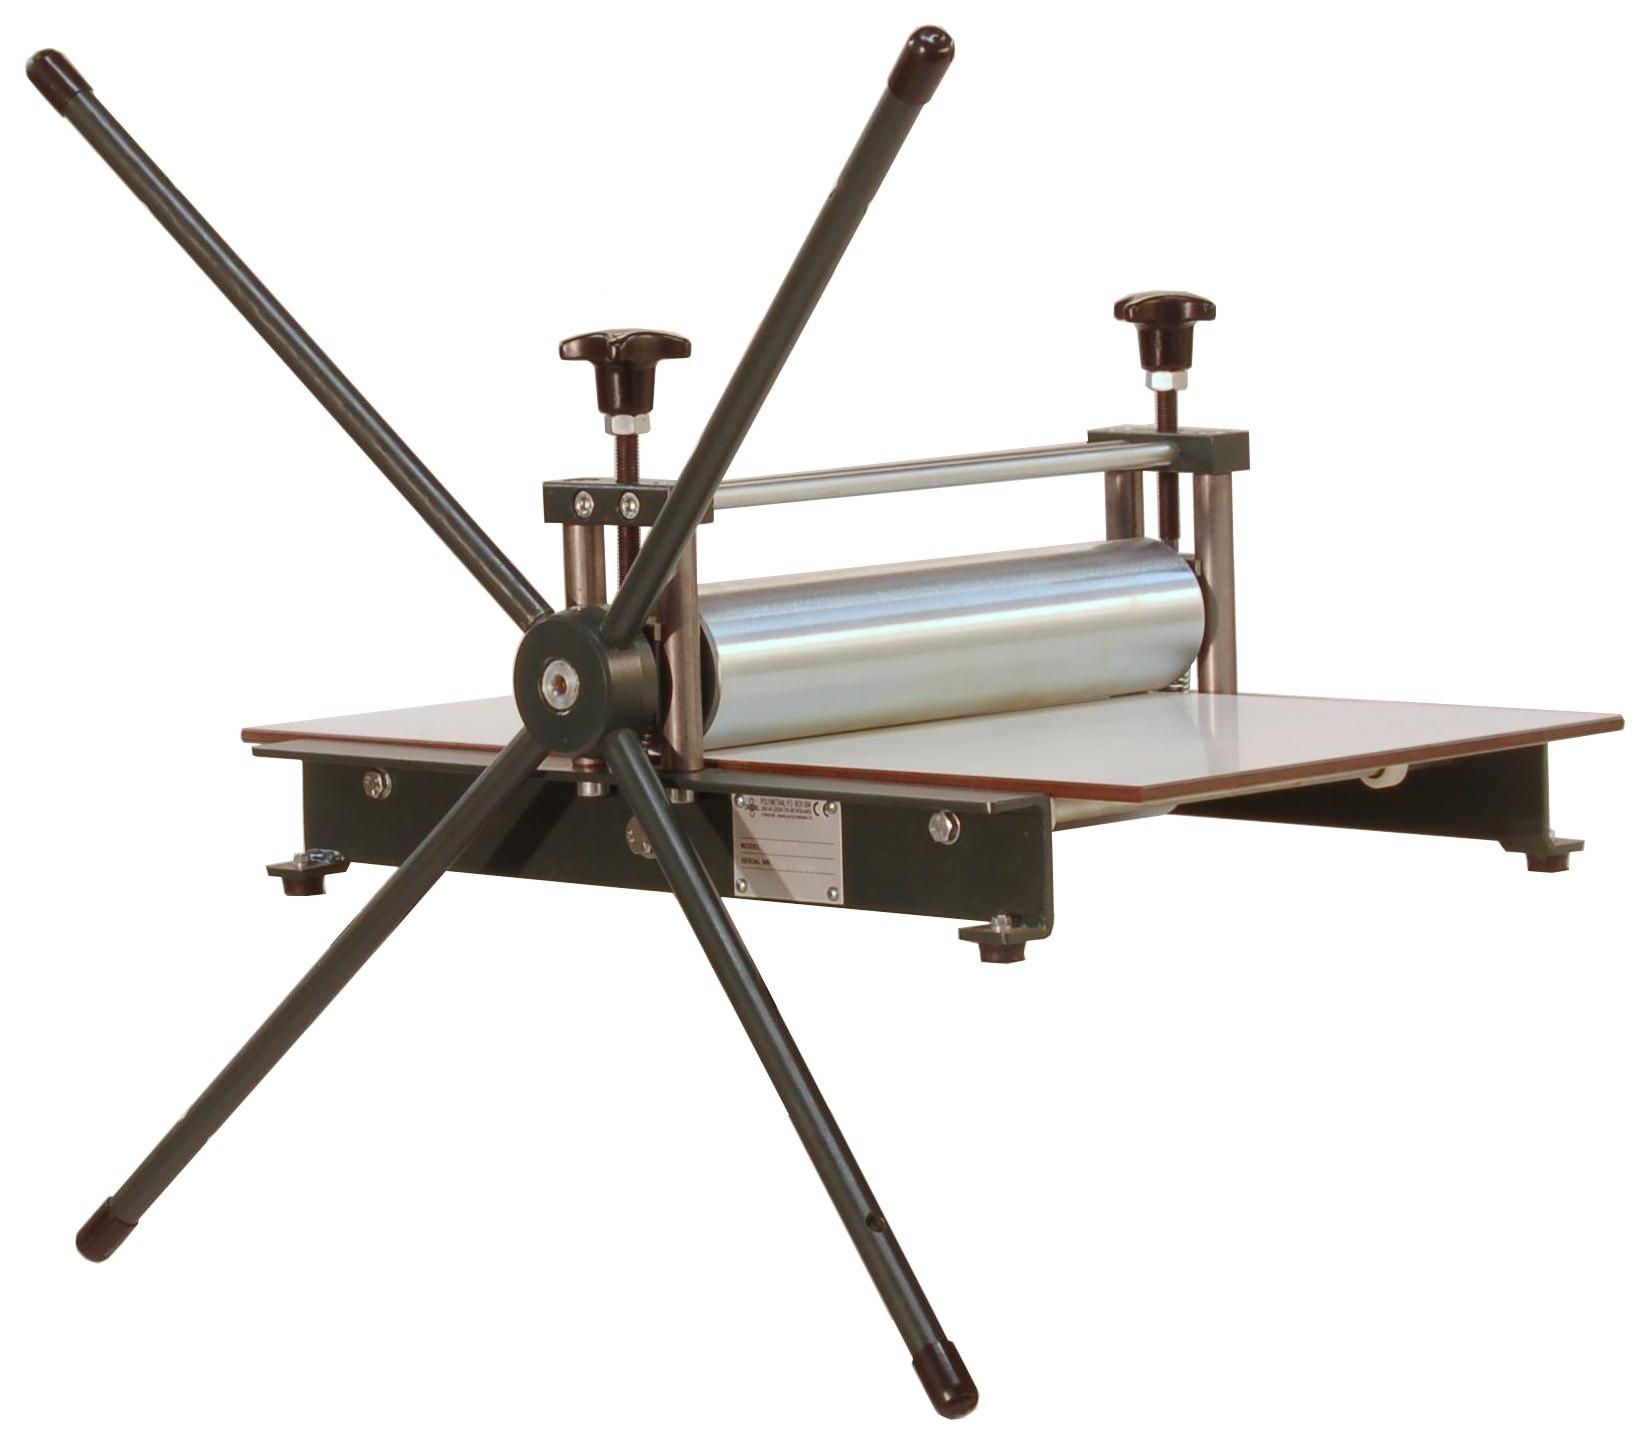 polymetaal printmaking equipment etspers hs 35. Black Bedroom Furniture Sets. Home Design Ideas